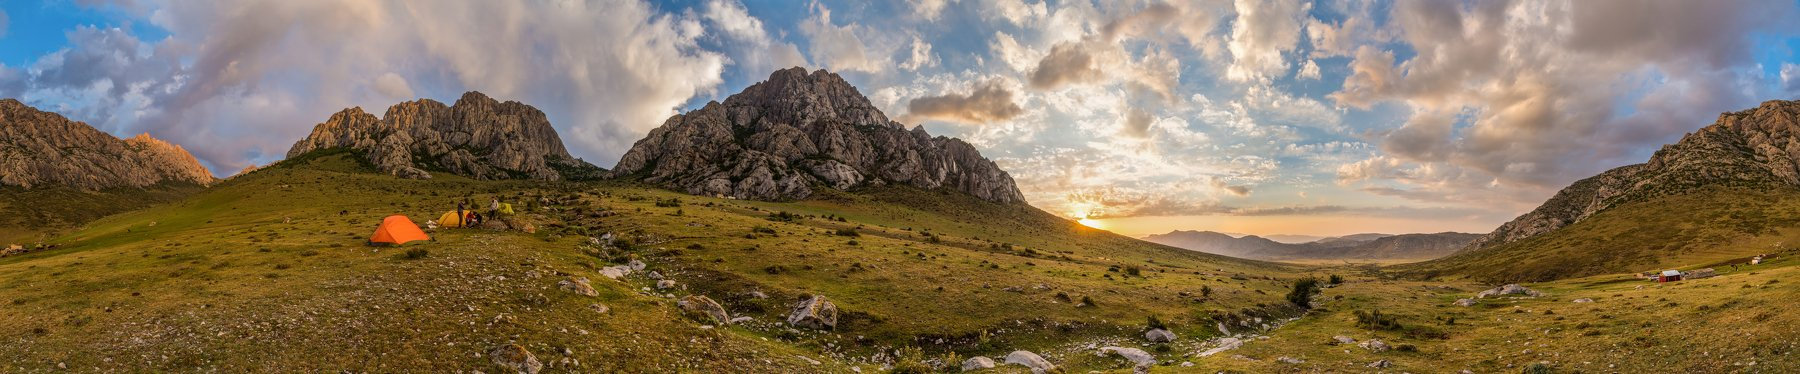 Каравшин, Памиро-Алай, Горы, Туркестанский хребет, Evgeniy Khilkevitch